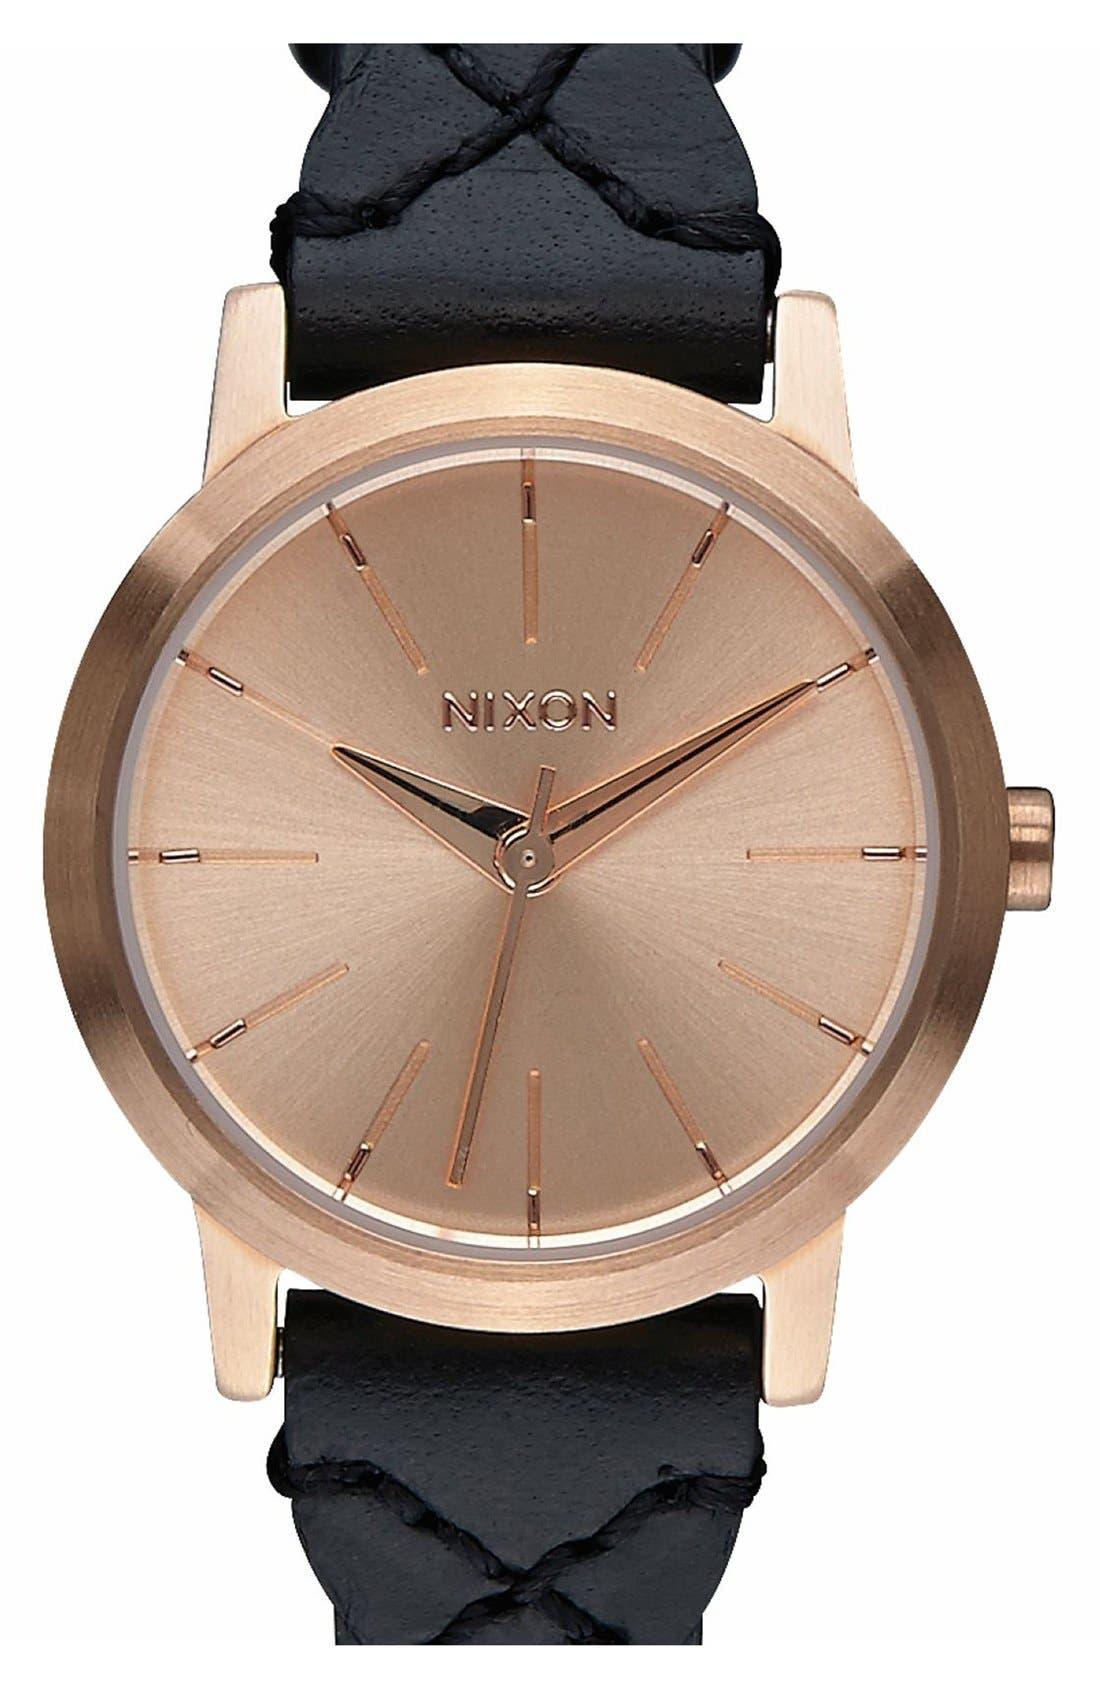 Main Image - Nixon 'The Kenzi' Round Leather Strap Watch, 26mm